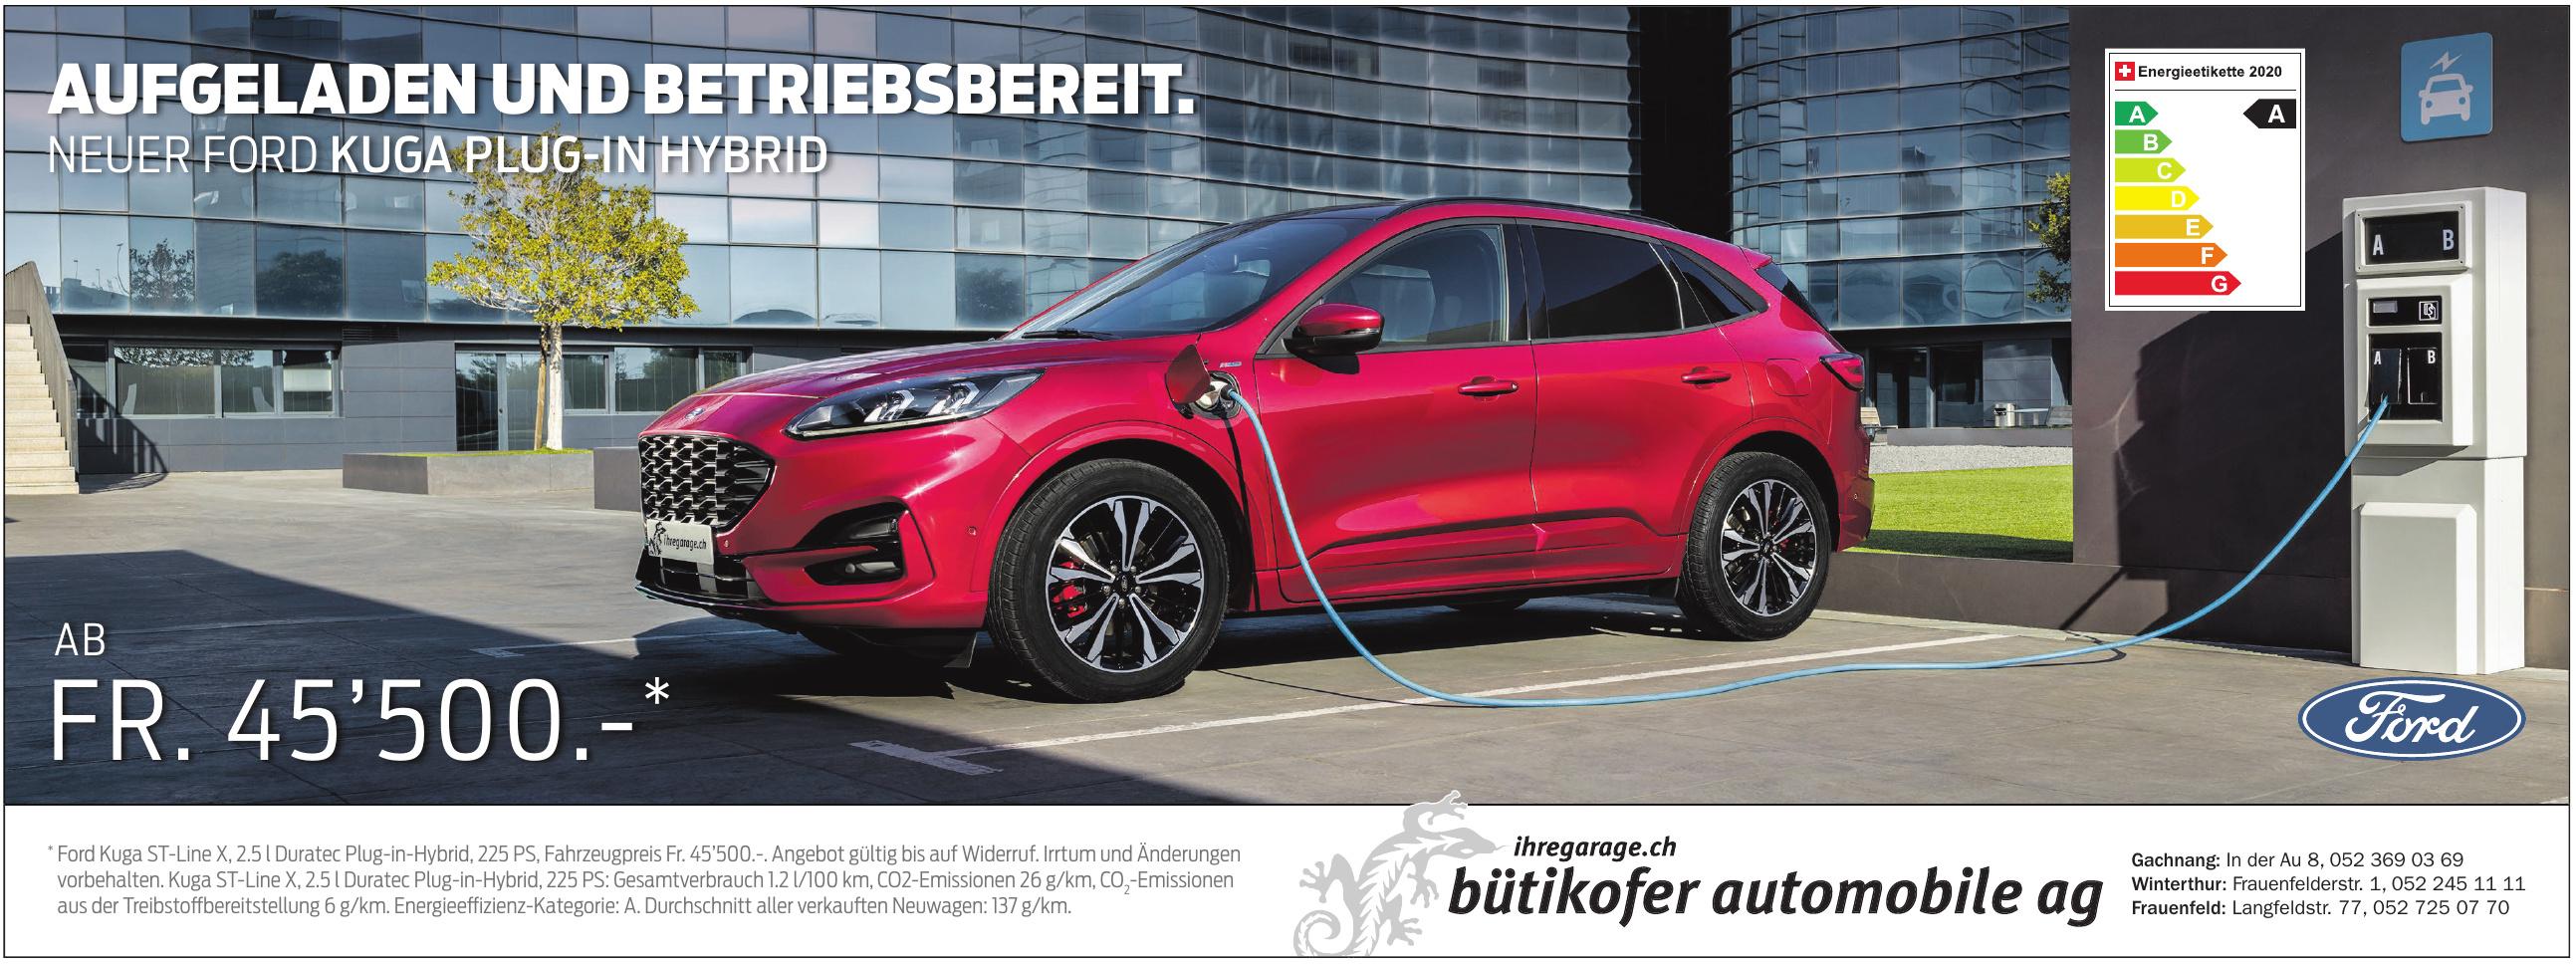 Bütikofer Automobile AG